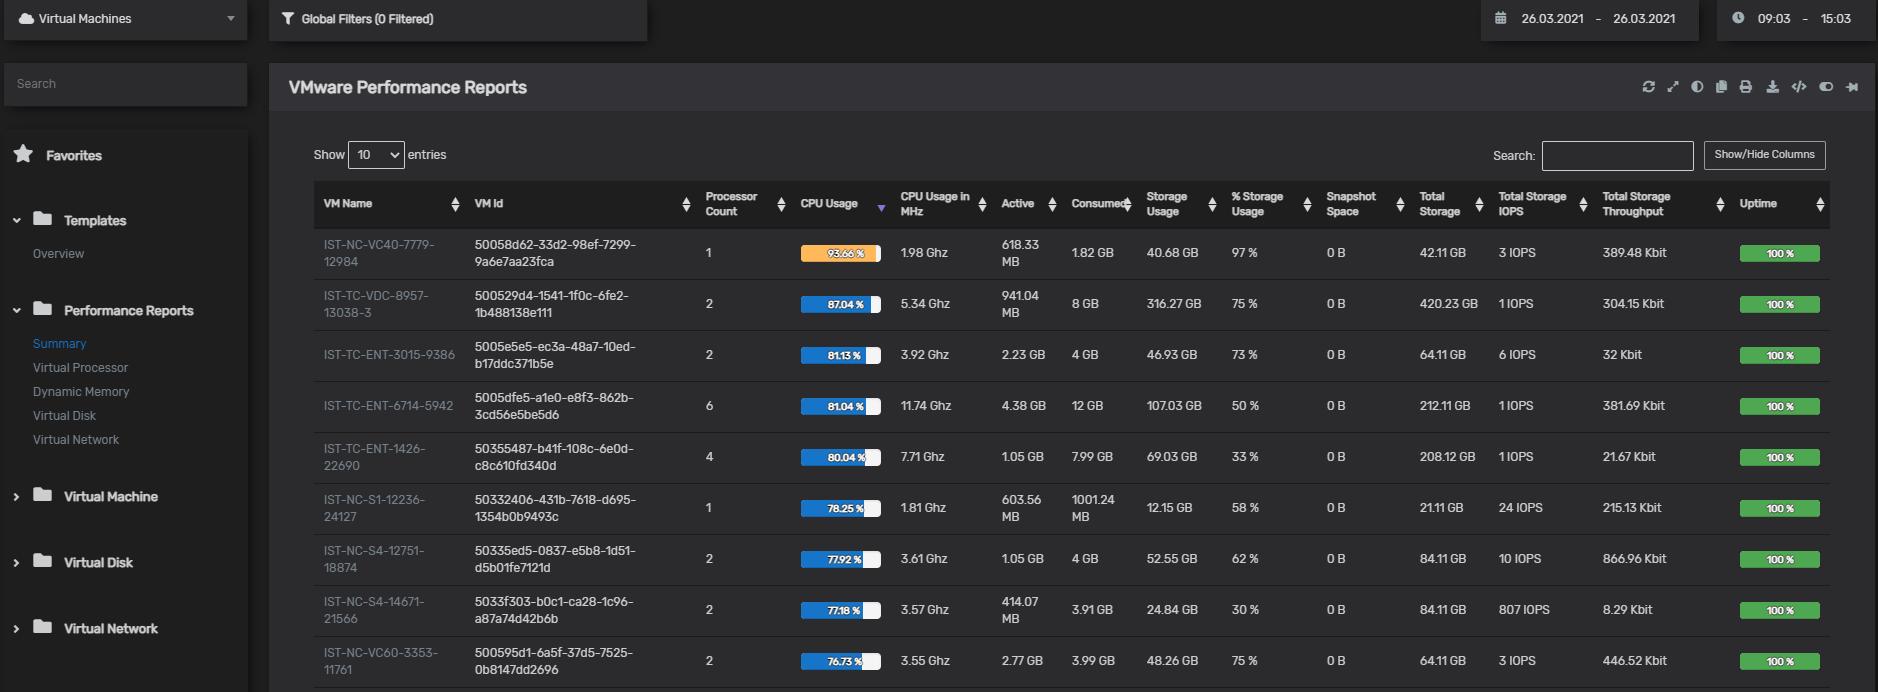 VMware Performance Reports